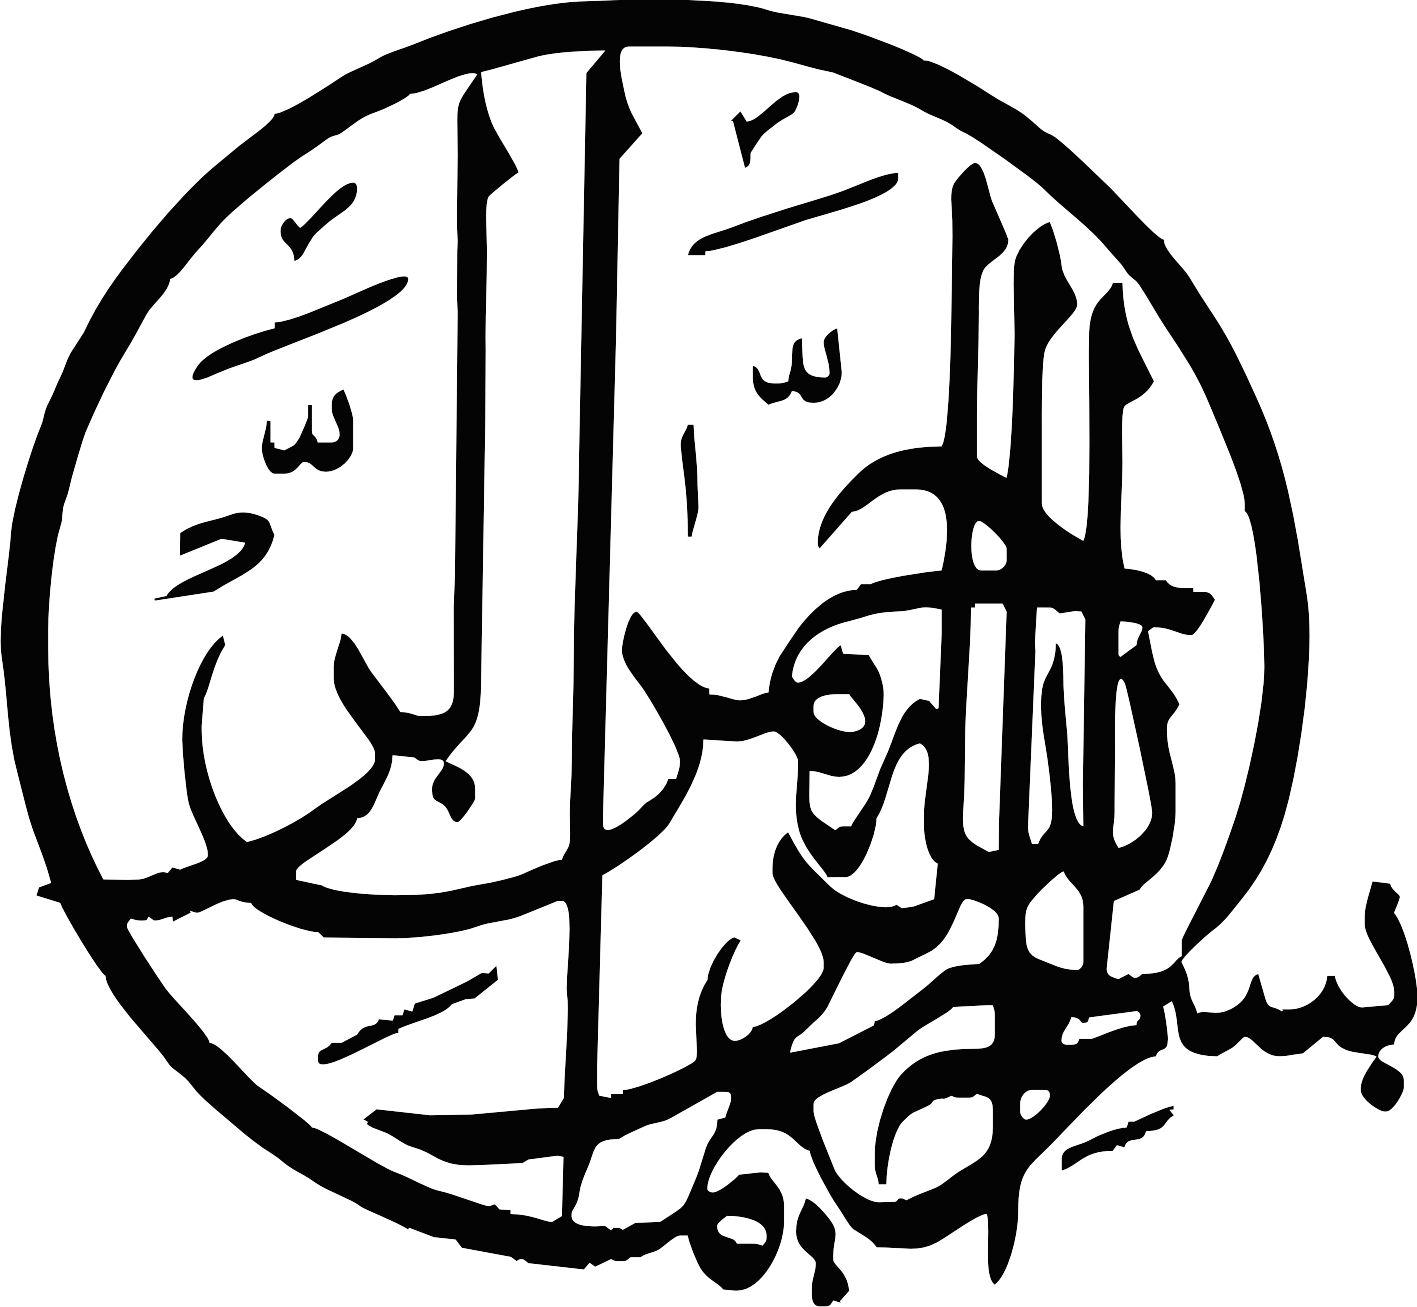 pictures-besmellah-www-mjjz_-ir-220